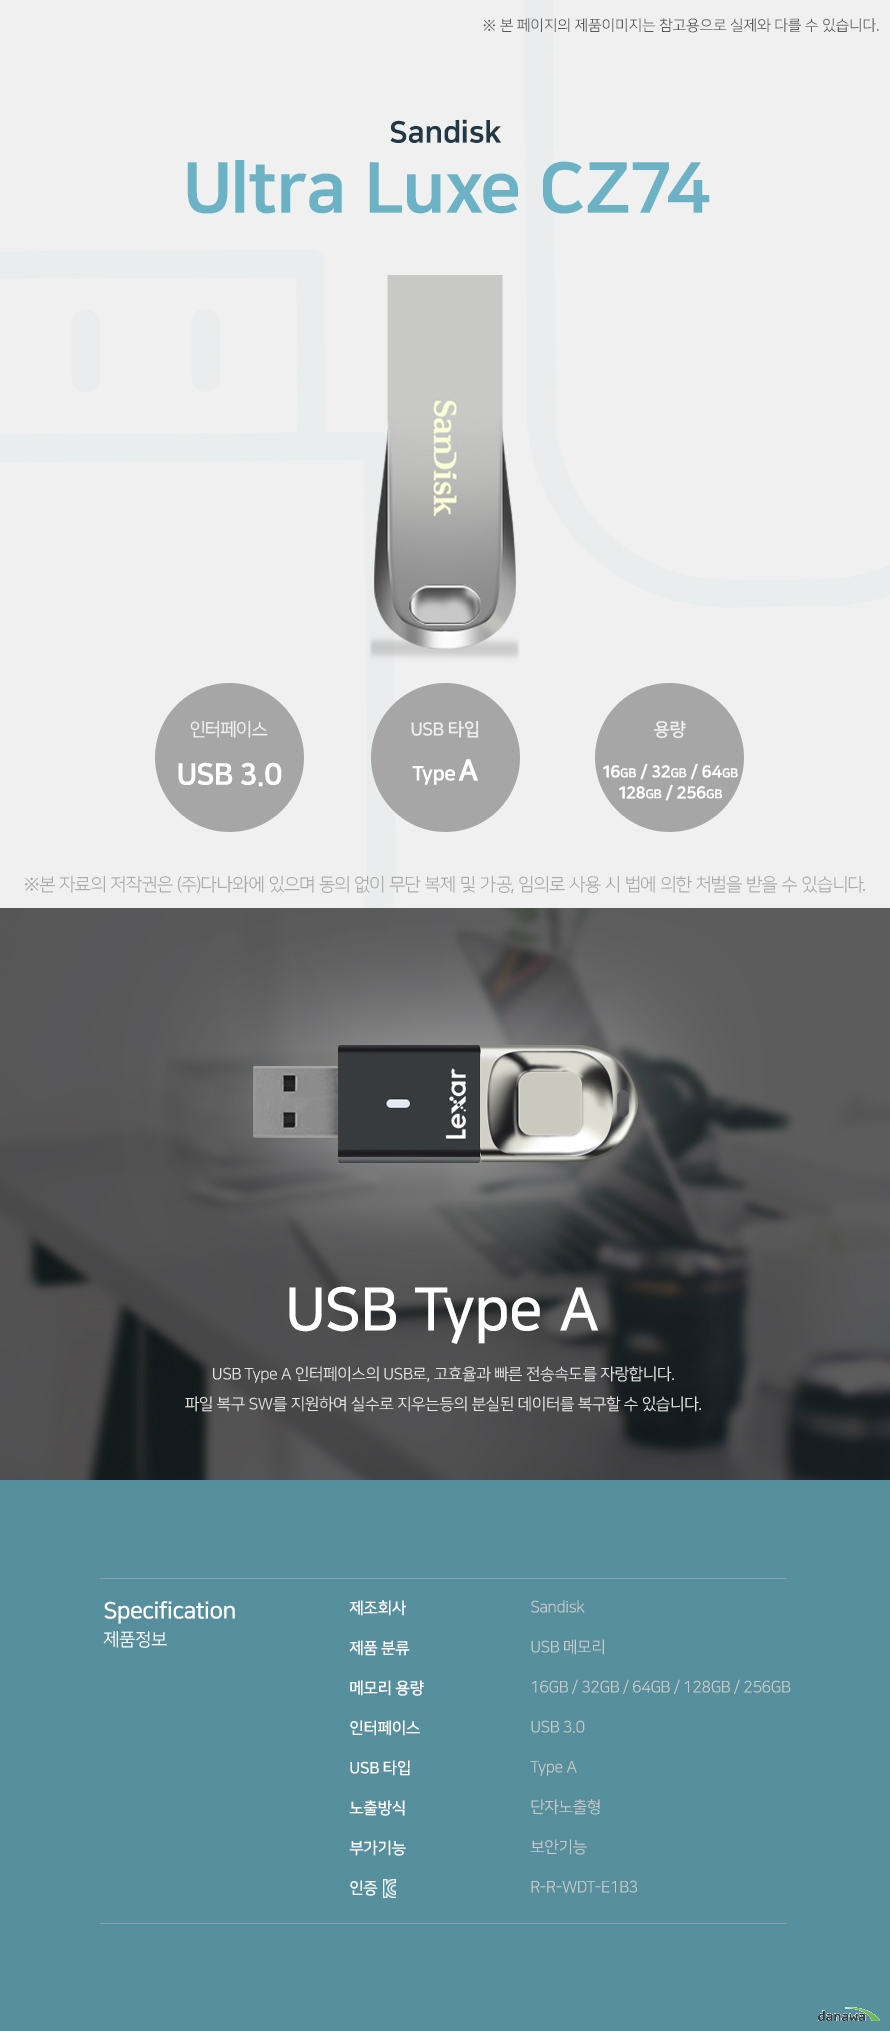 Sandisk Ultra Luxe CZ74 USB Type A USB Type A 인터페이스의 USB로, 고효율과 빠른 전송속도를 자랑합니다. 파일 복구 SW를 지원하여 실수로 지우는등의 분실된 데이터를 복구할 수 있습니다. 스펙 제조회사 Sandisk 제품 분류 USB 메모리 메모리 용량 16GB / 32GB / 64GB / 128GB / 256GB 인터페이스 USB 3.0 USB 타입 Type A 노출방식 단자노출형 부가기능 보안기능 KC인증 R-R-WDT-E1B3